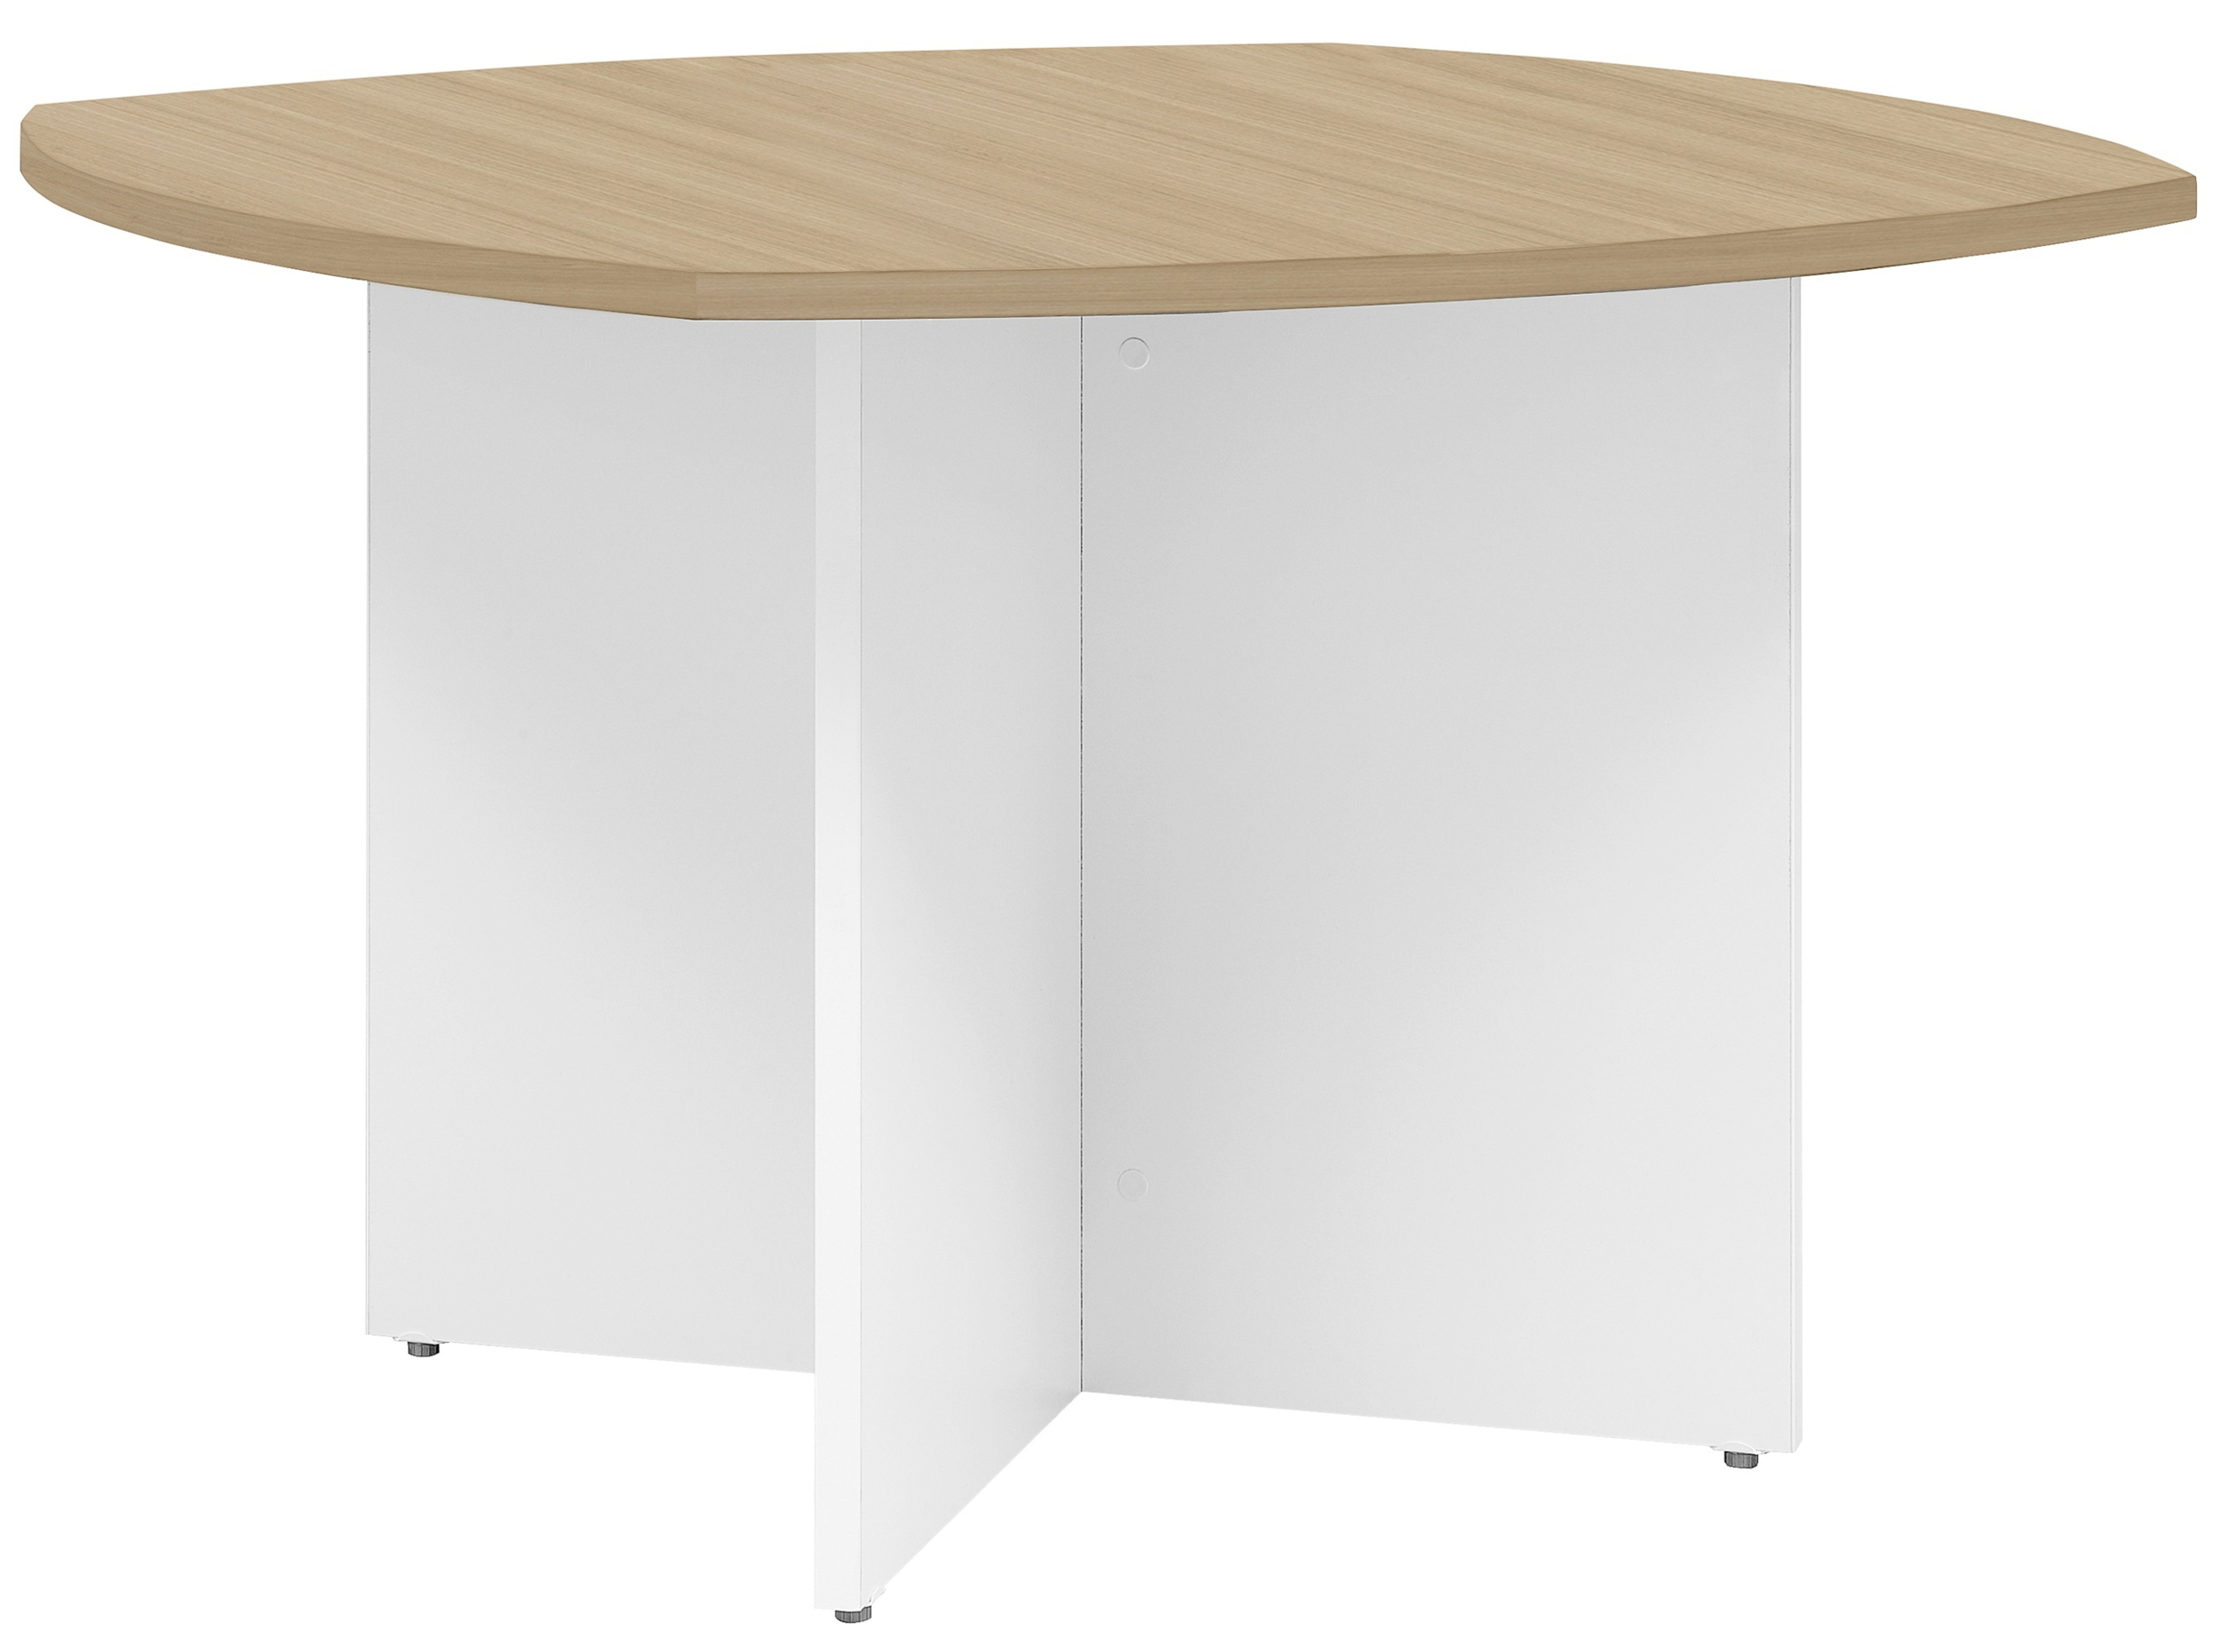 YES/XERUS CHÊNE NATUREL TABLE RONDE